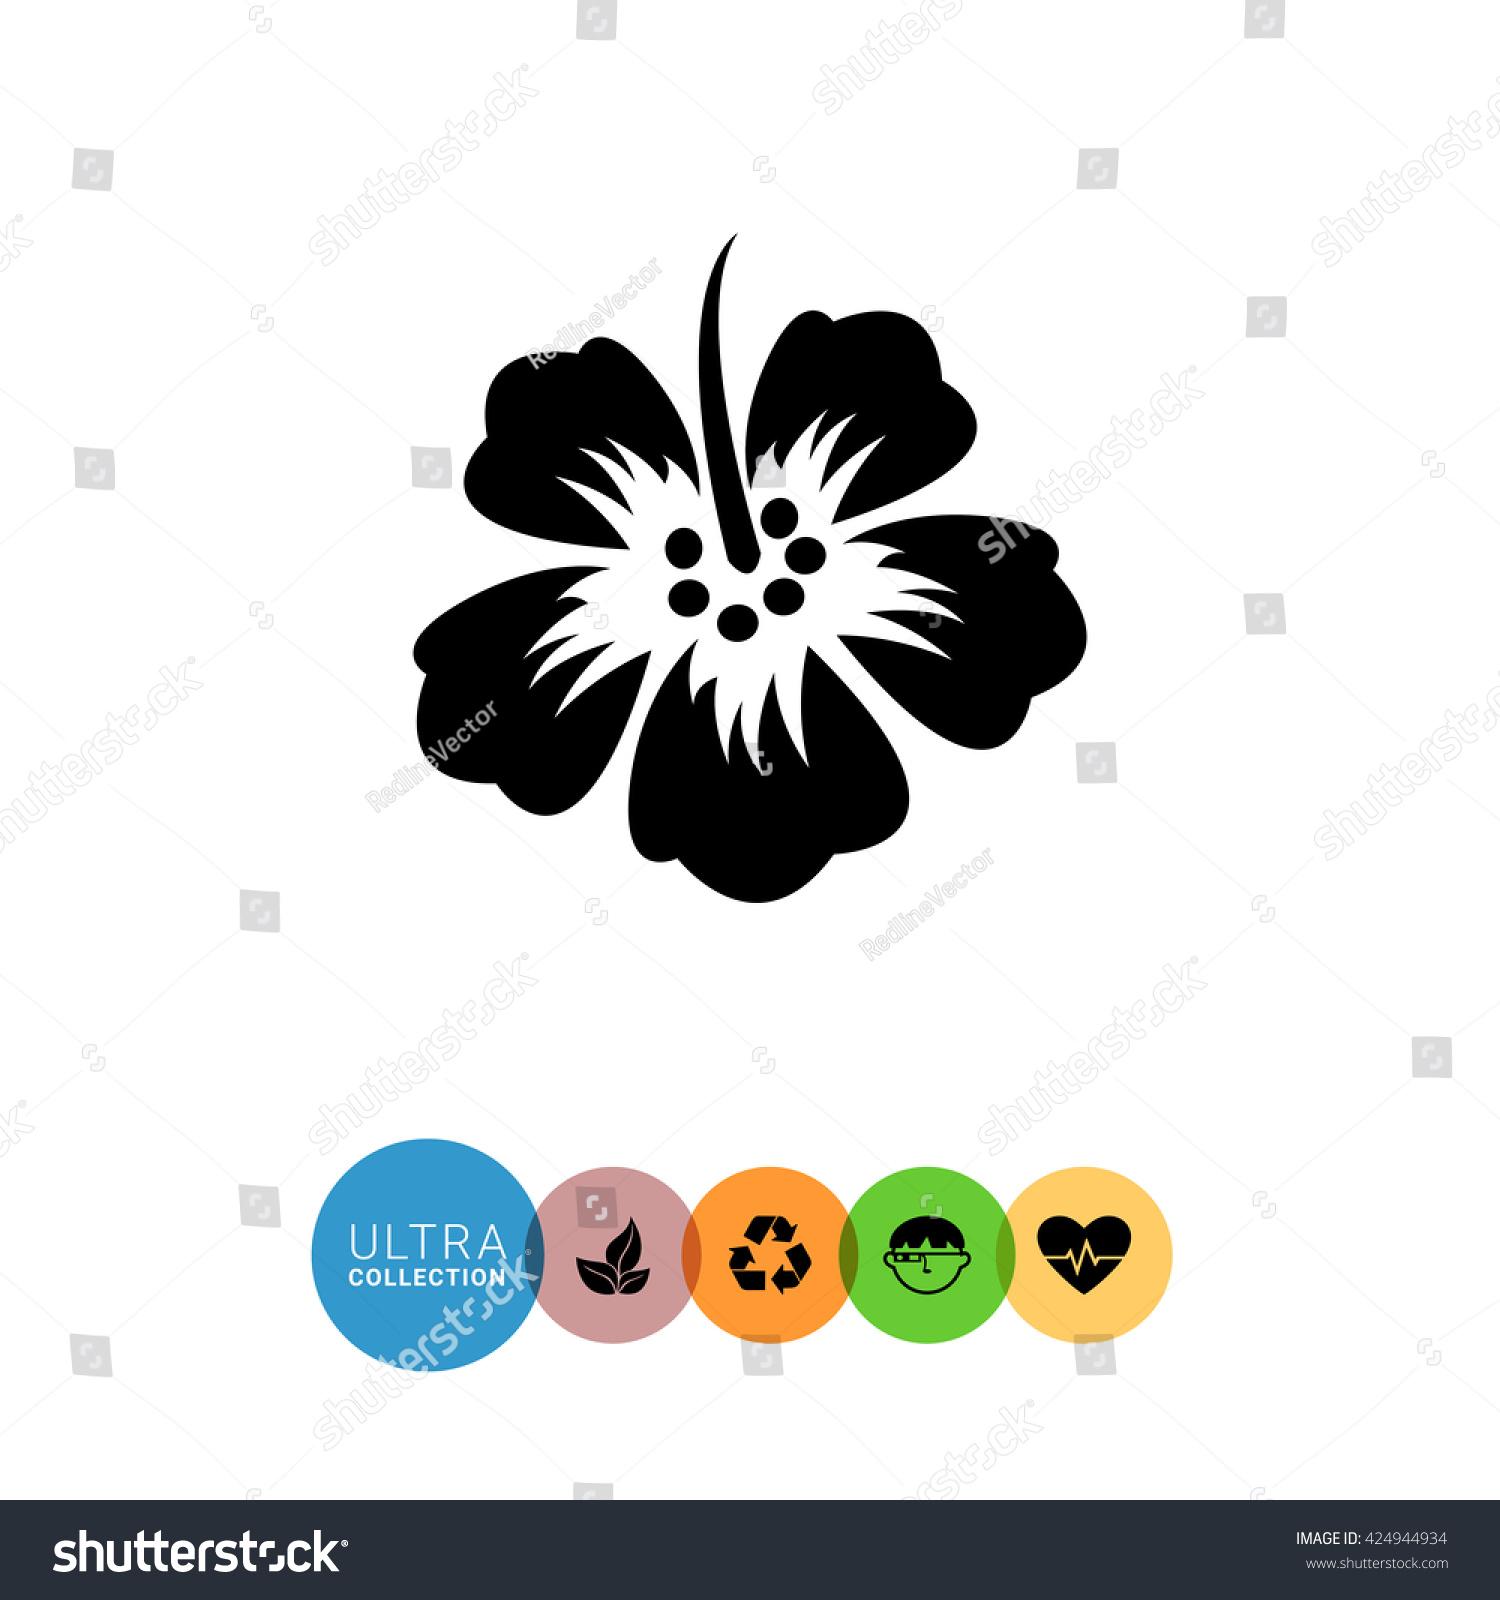 Hibiscus Flower Black Color Illustration Tropical Flower Silhouette